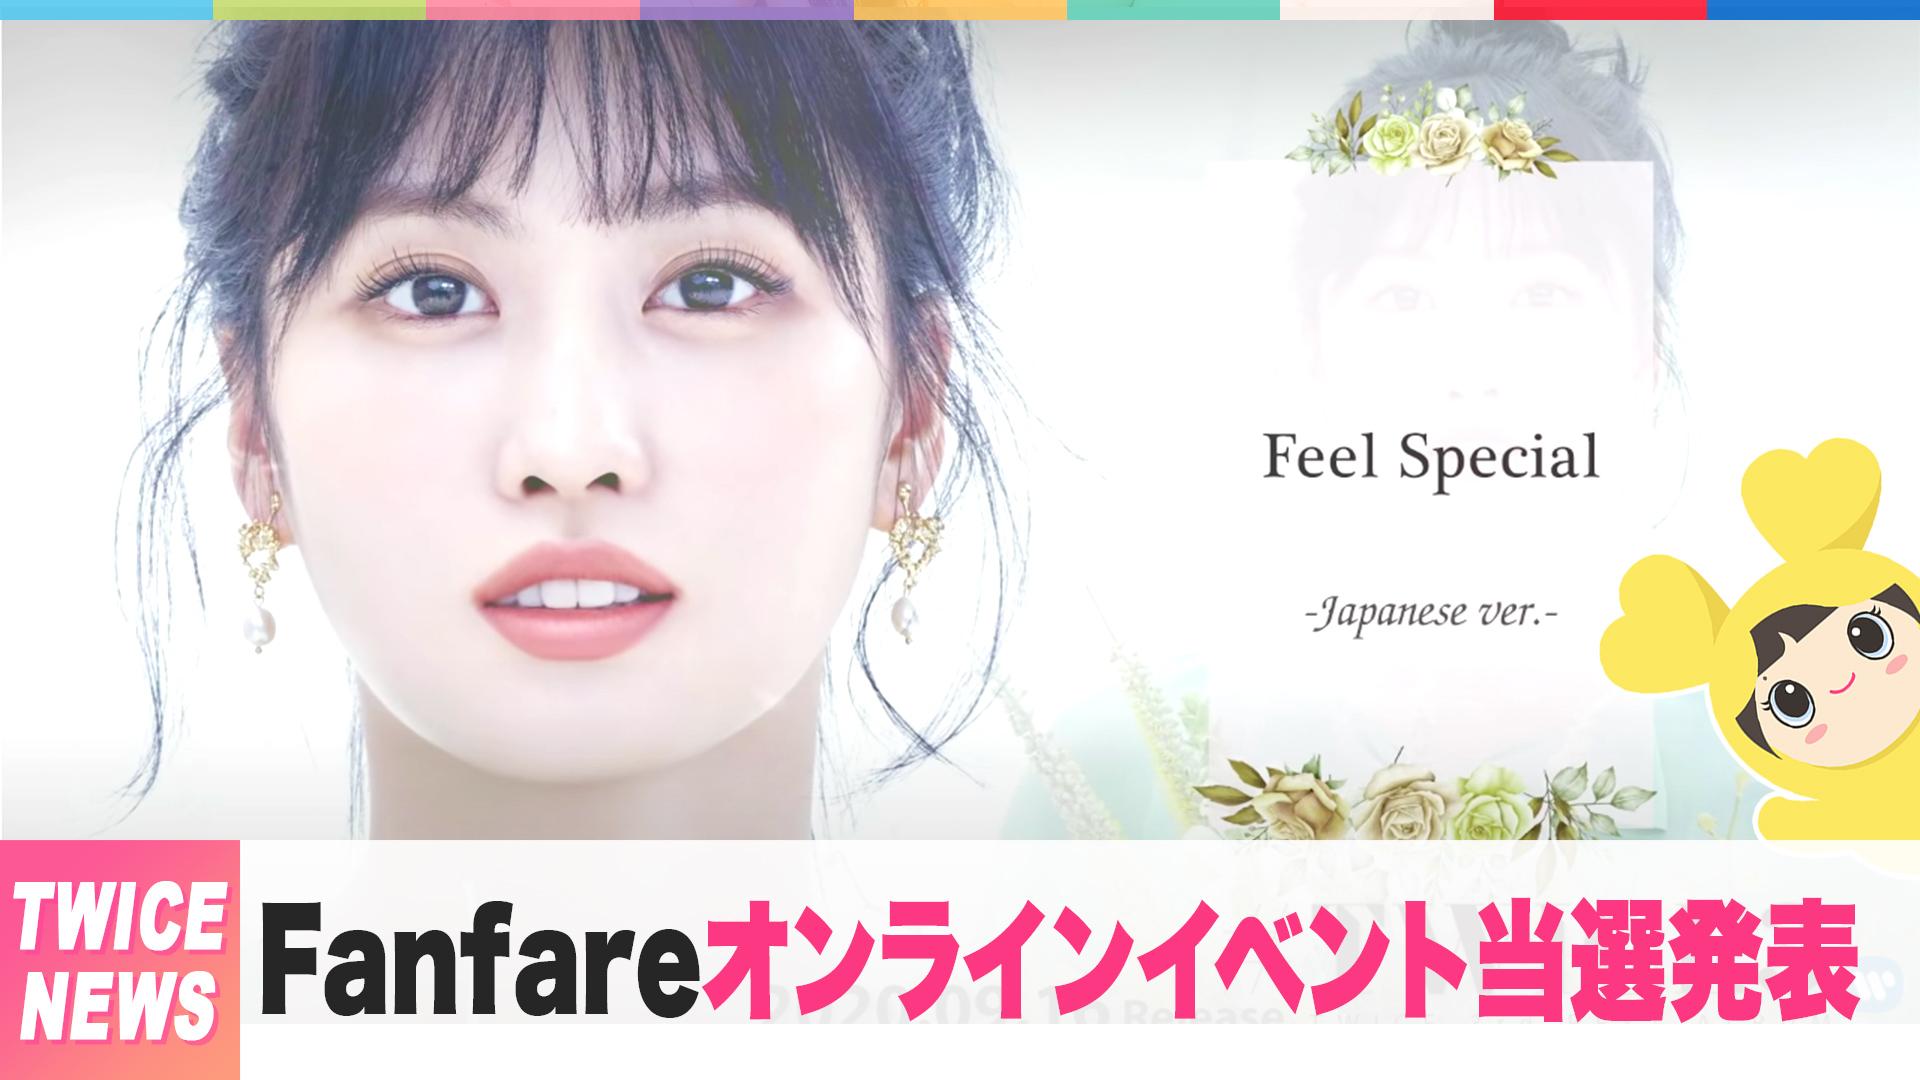 TWICEニュース Fanfareオンラインイベント当落、FANCY日本語版MV公開など